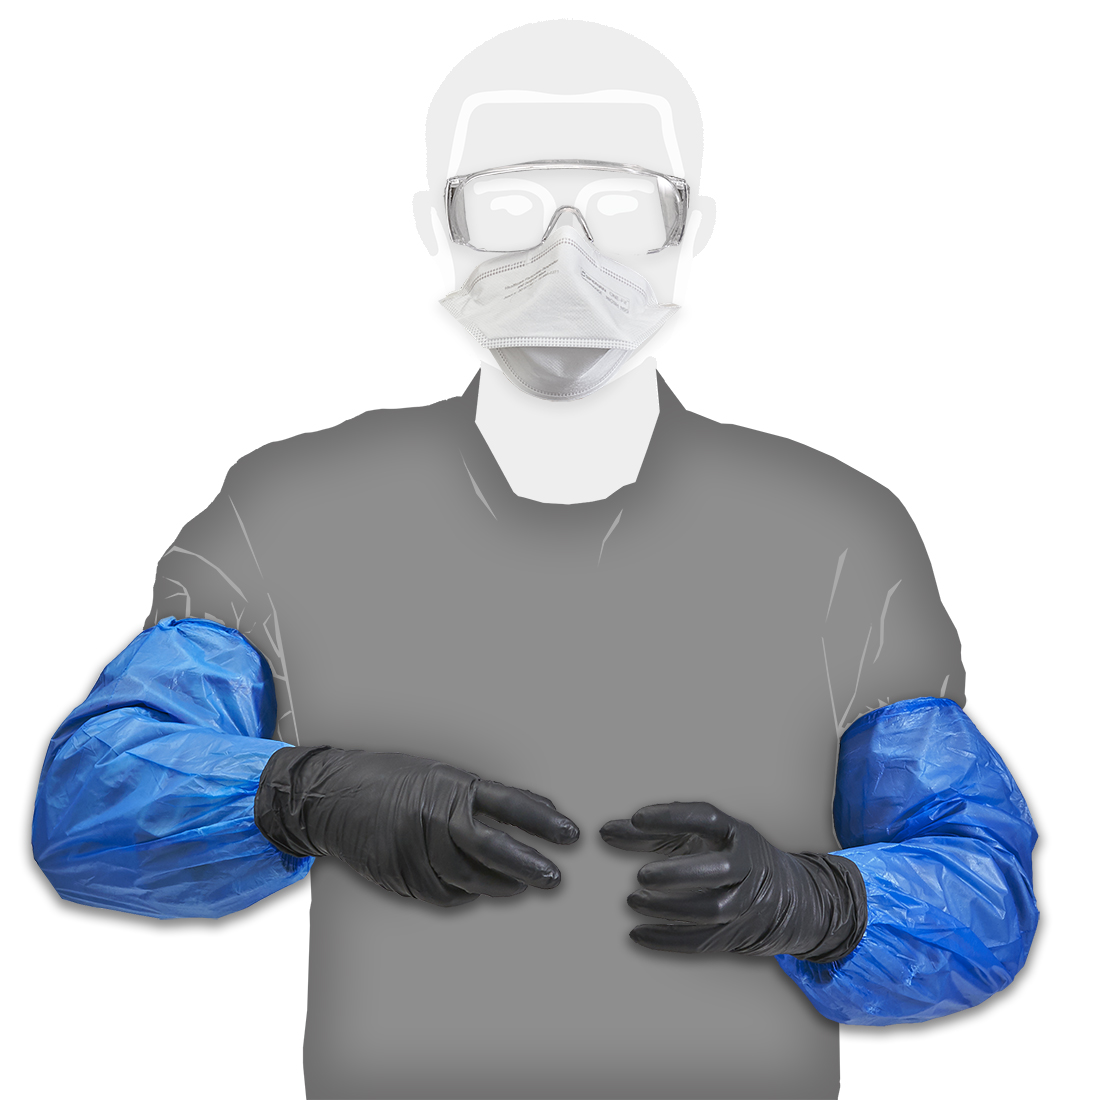 Sentry Shield QP - Powdered Substance Defense Kit image